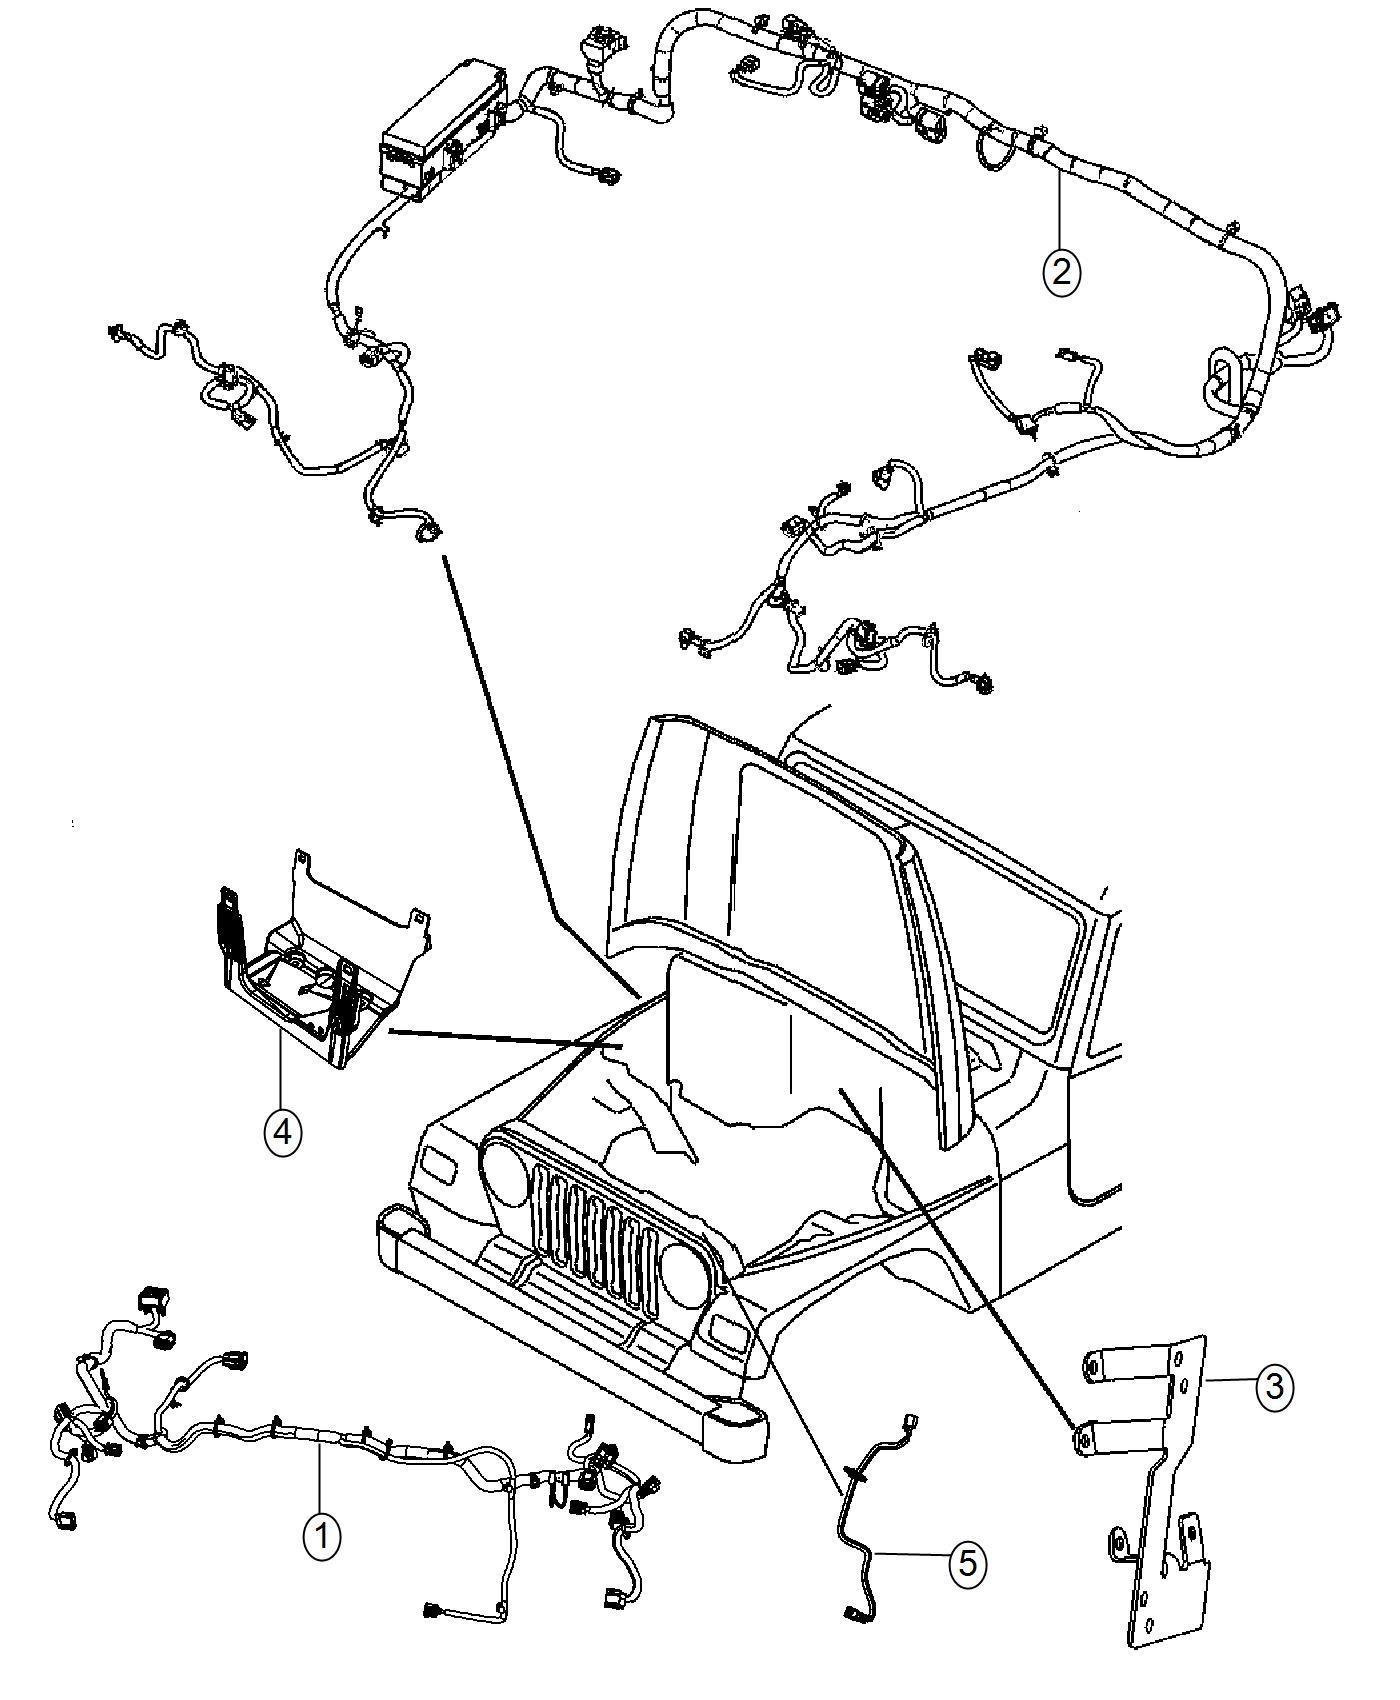 tags: #gm headlight switch wiring#1980 jeep cj7 wiring diagram#1982 jeep  cj7 wiring diagram#cj7 wiring diagram#1953 chevy headlight switch wiring#1986  jeep